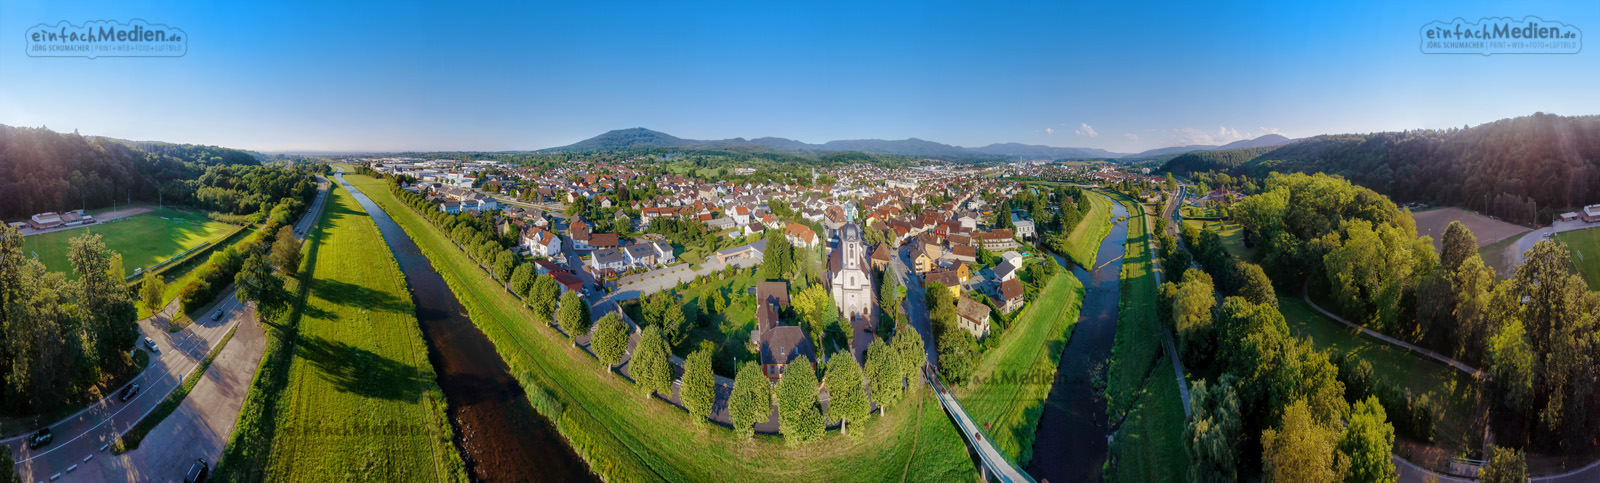 DSC8287-OK_Rotenfels_Gaggenau_St_Laurentius Luftbilder